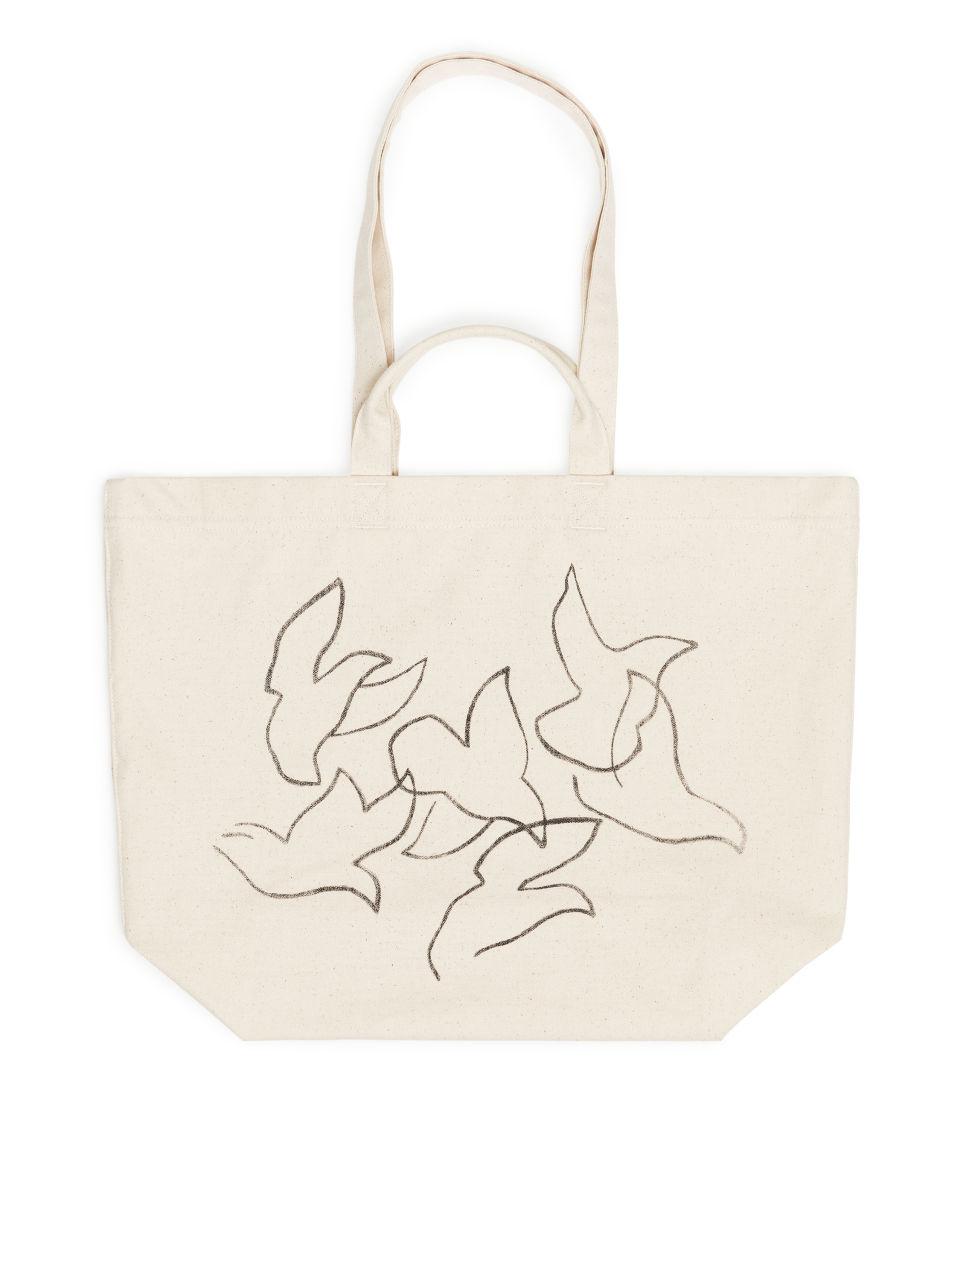 Bird Motif Canvas Tote Bag - White